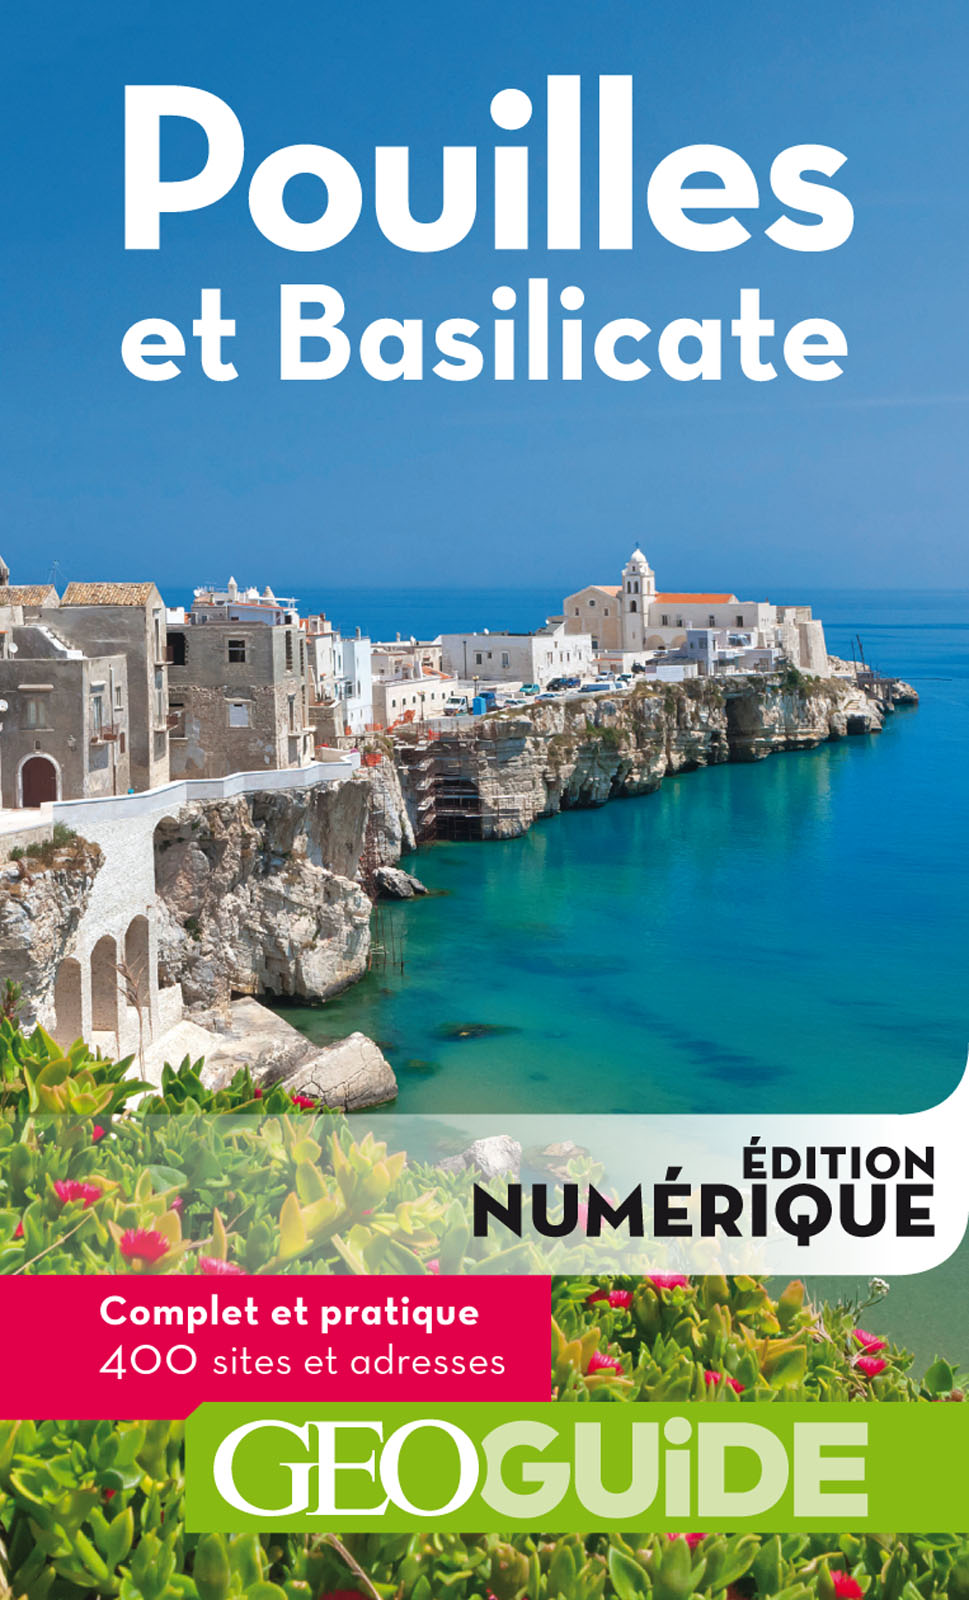 GEOguide Pouilles et Basilicate | Collectif,